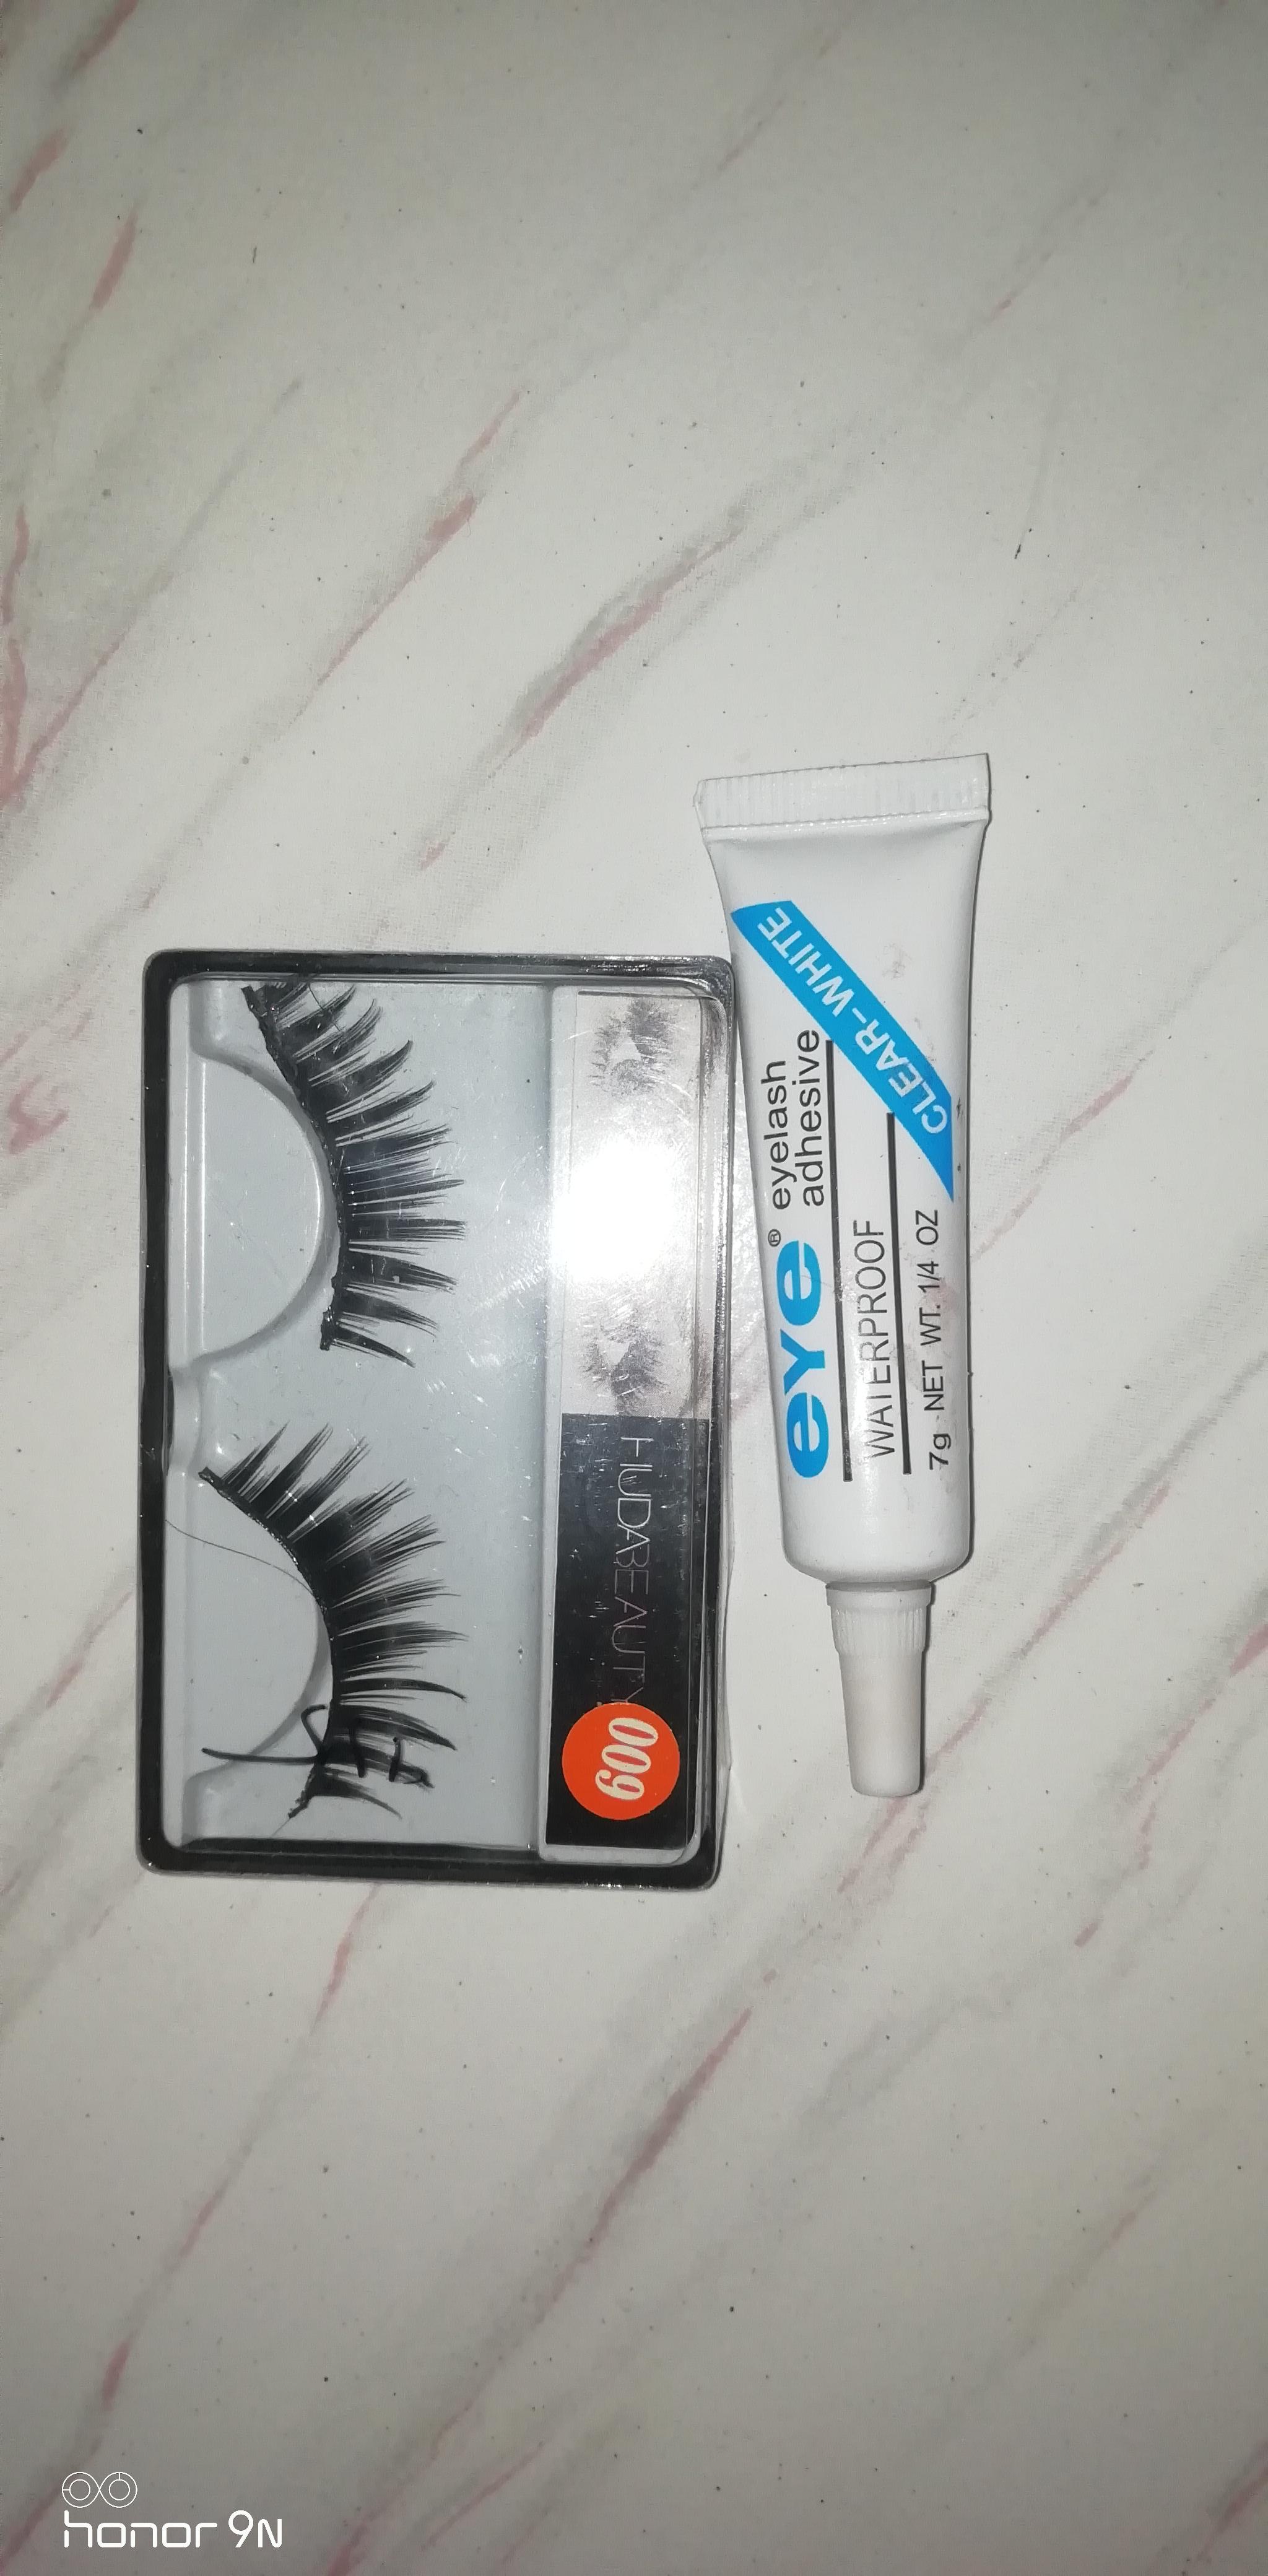 Huda Beauty Classic Lash pic 1-Best reusable lashes-By prajeesha_